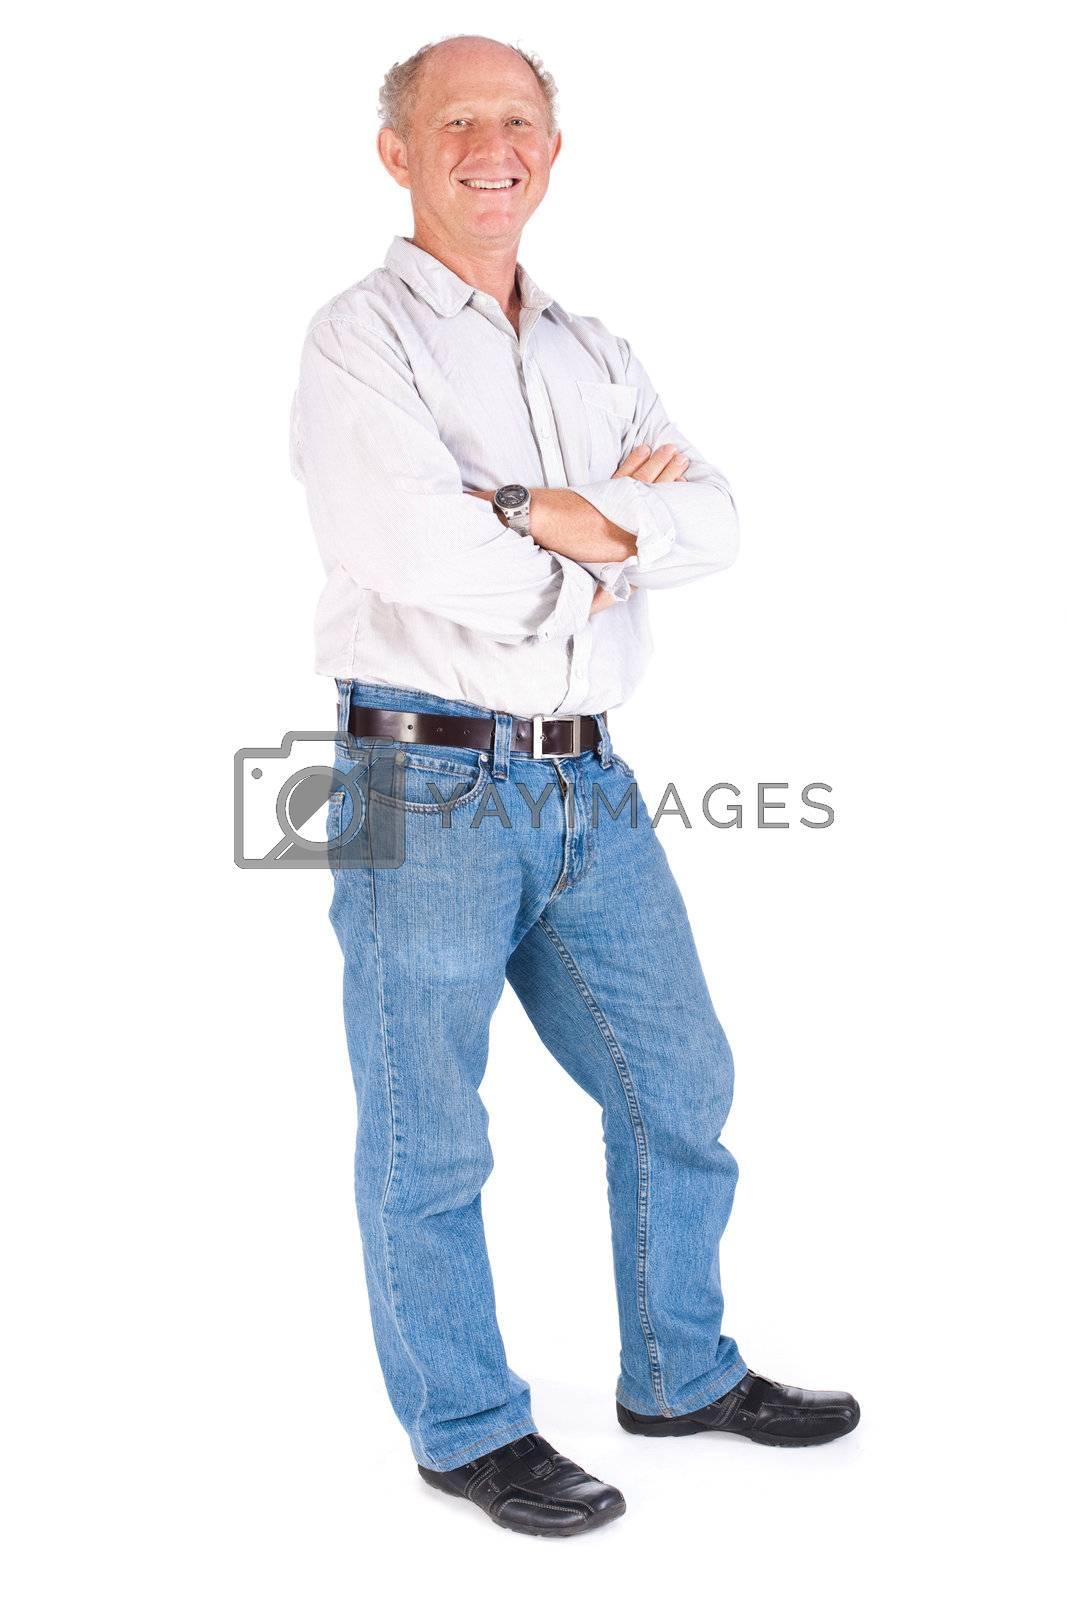 Studio portrait of smiling senior man in casuals against white background.